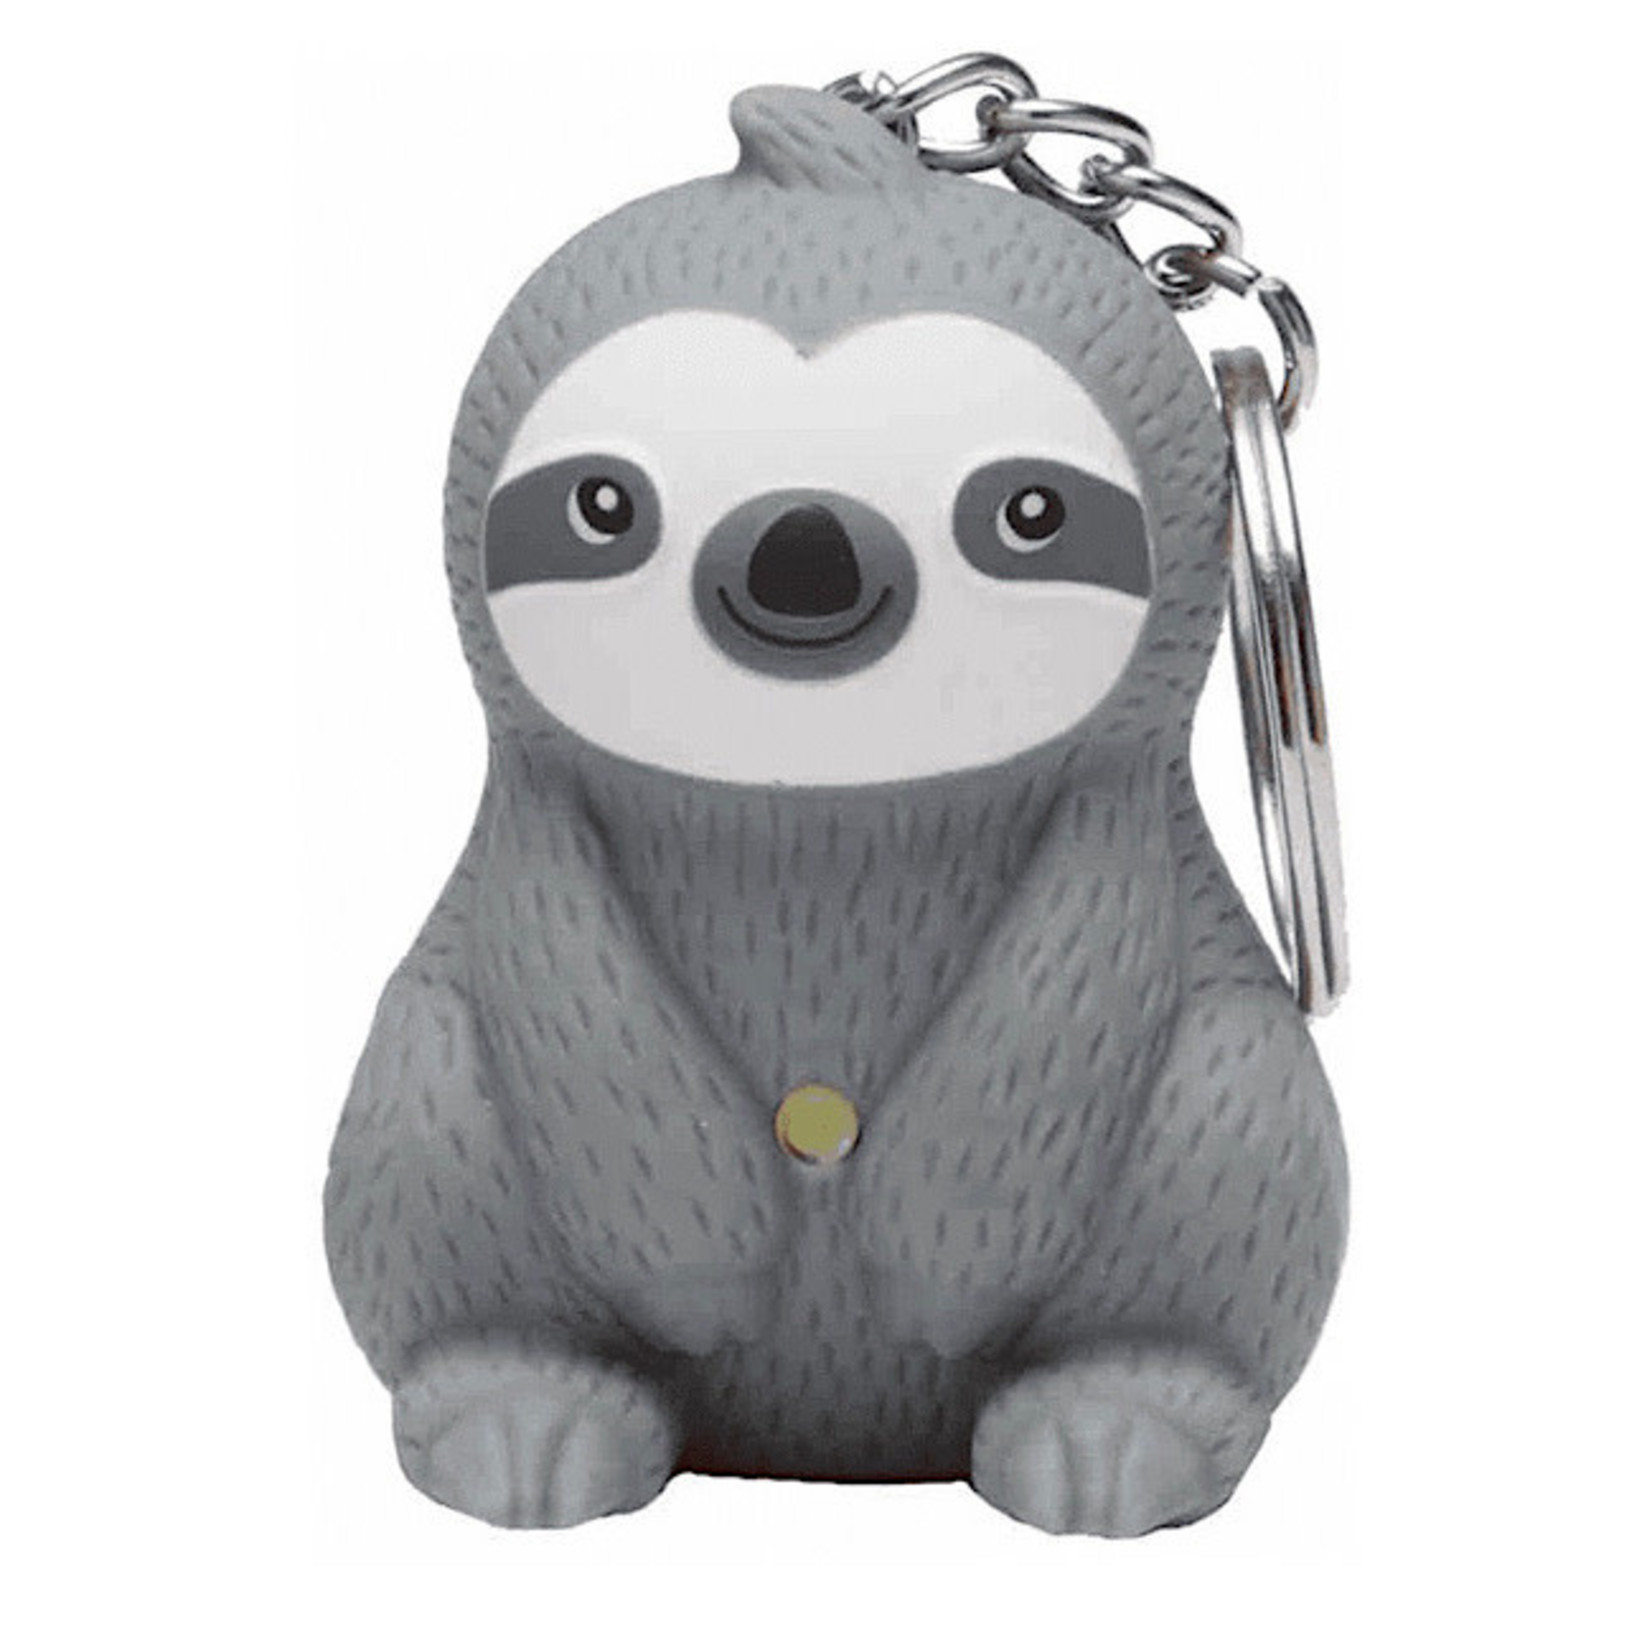 KeyChain (LED) - Sloth (Gray)